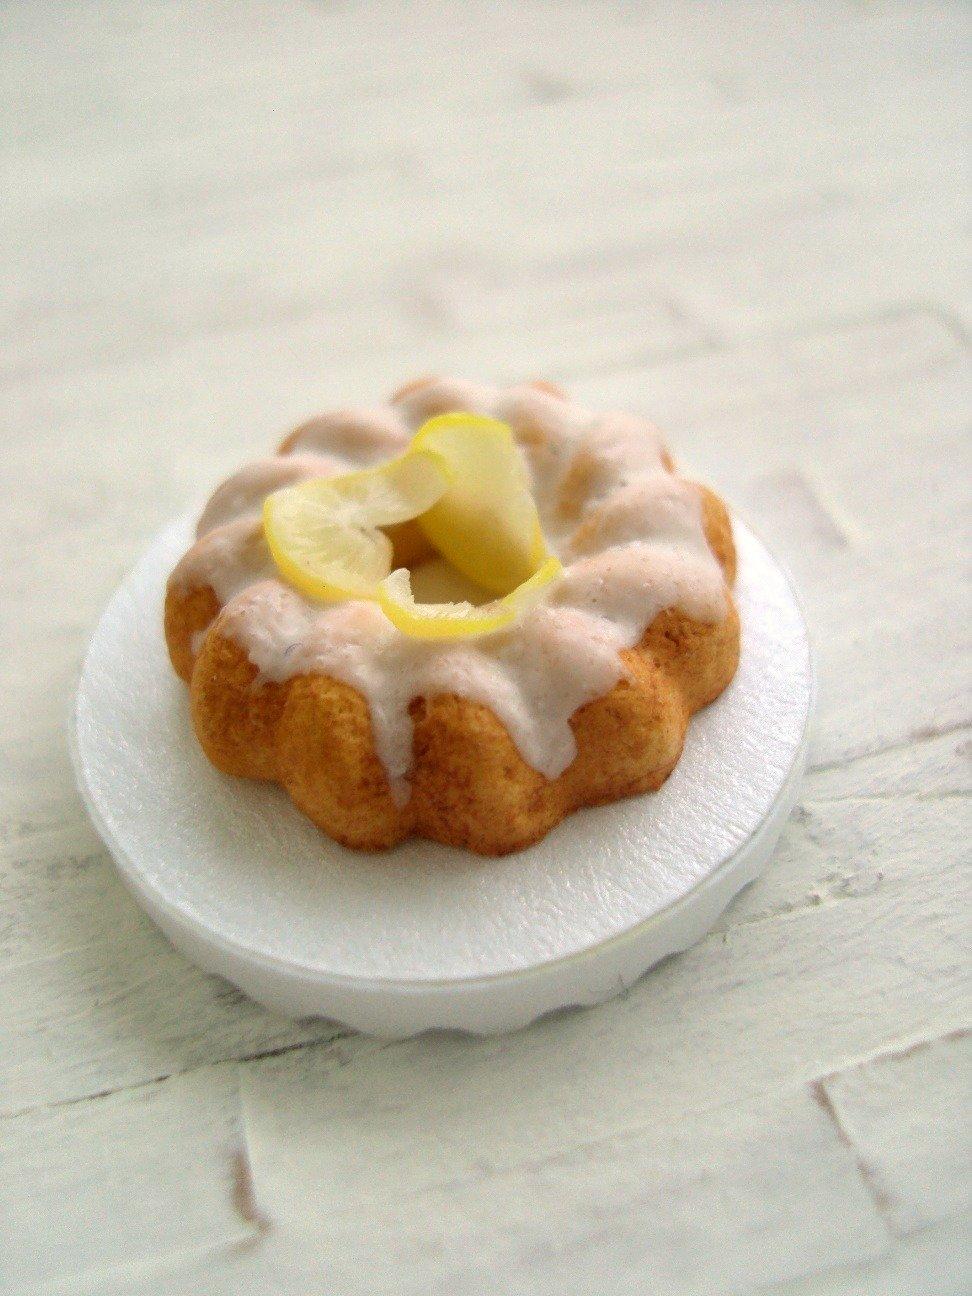 Miniature Lemon Bundt Cake - 1/12 Scale Dollhouse Miniature